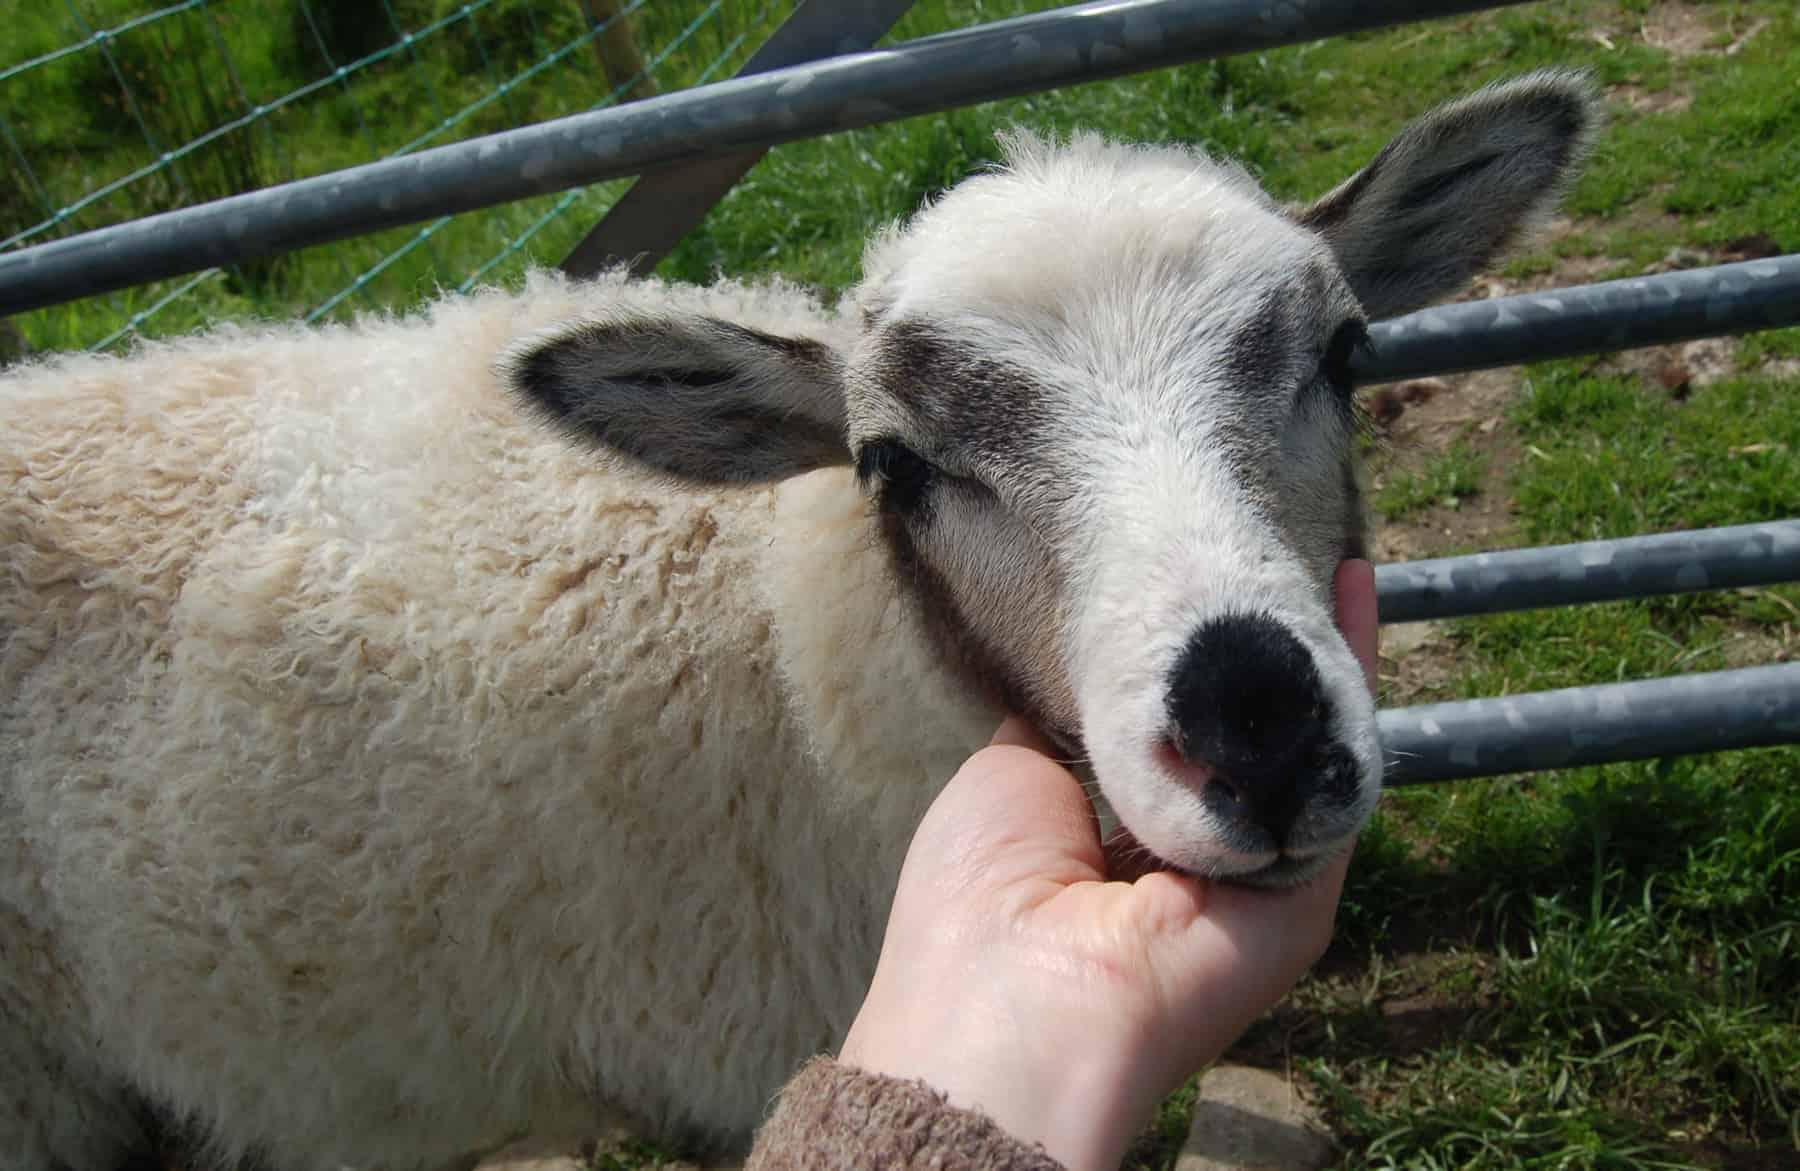 patchwork sheep pet sheepsmudge cute lamb golden soay cross shetland jacob sheep